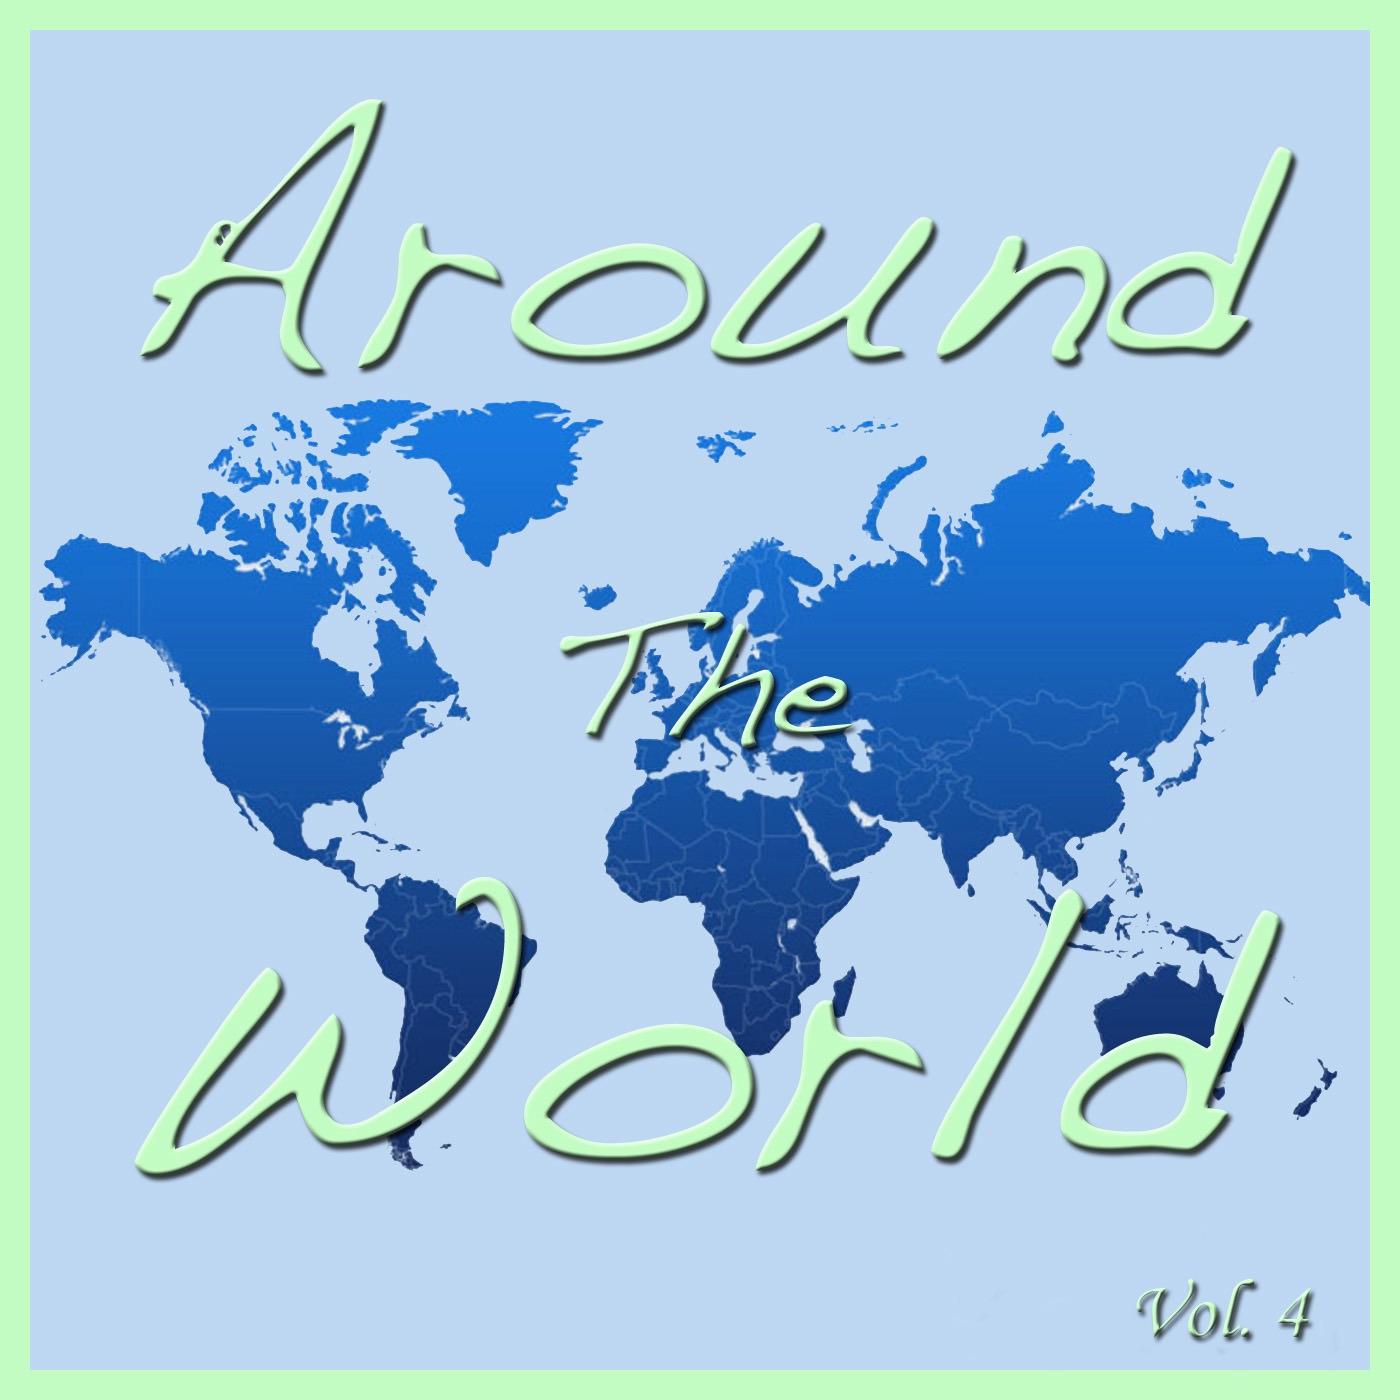 Around the World, Vol. 4